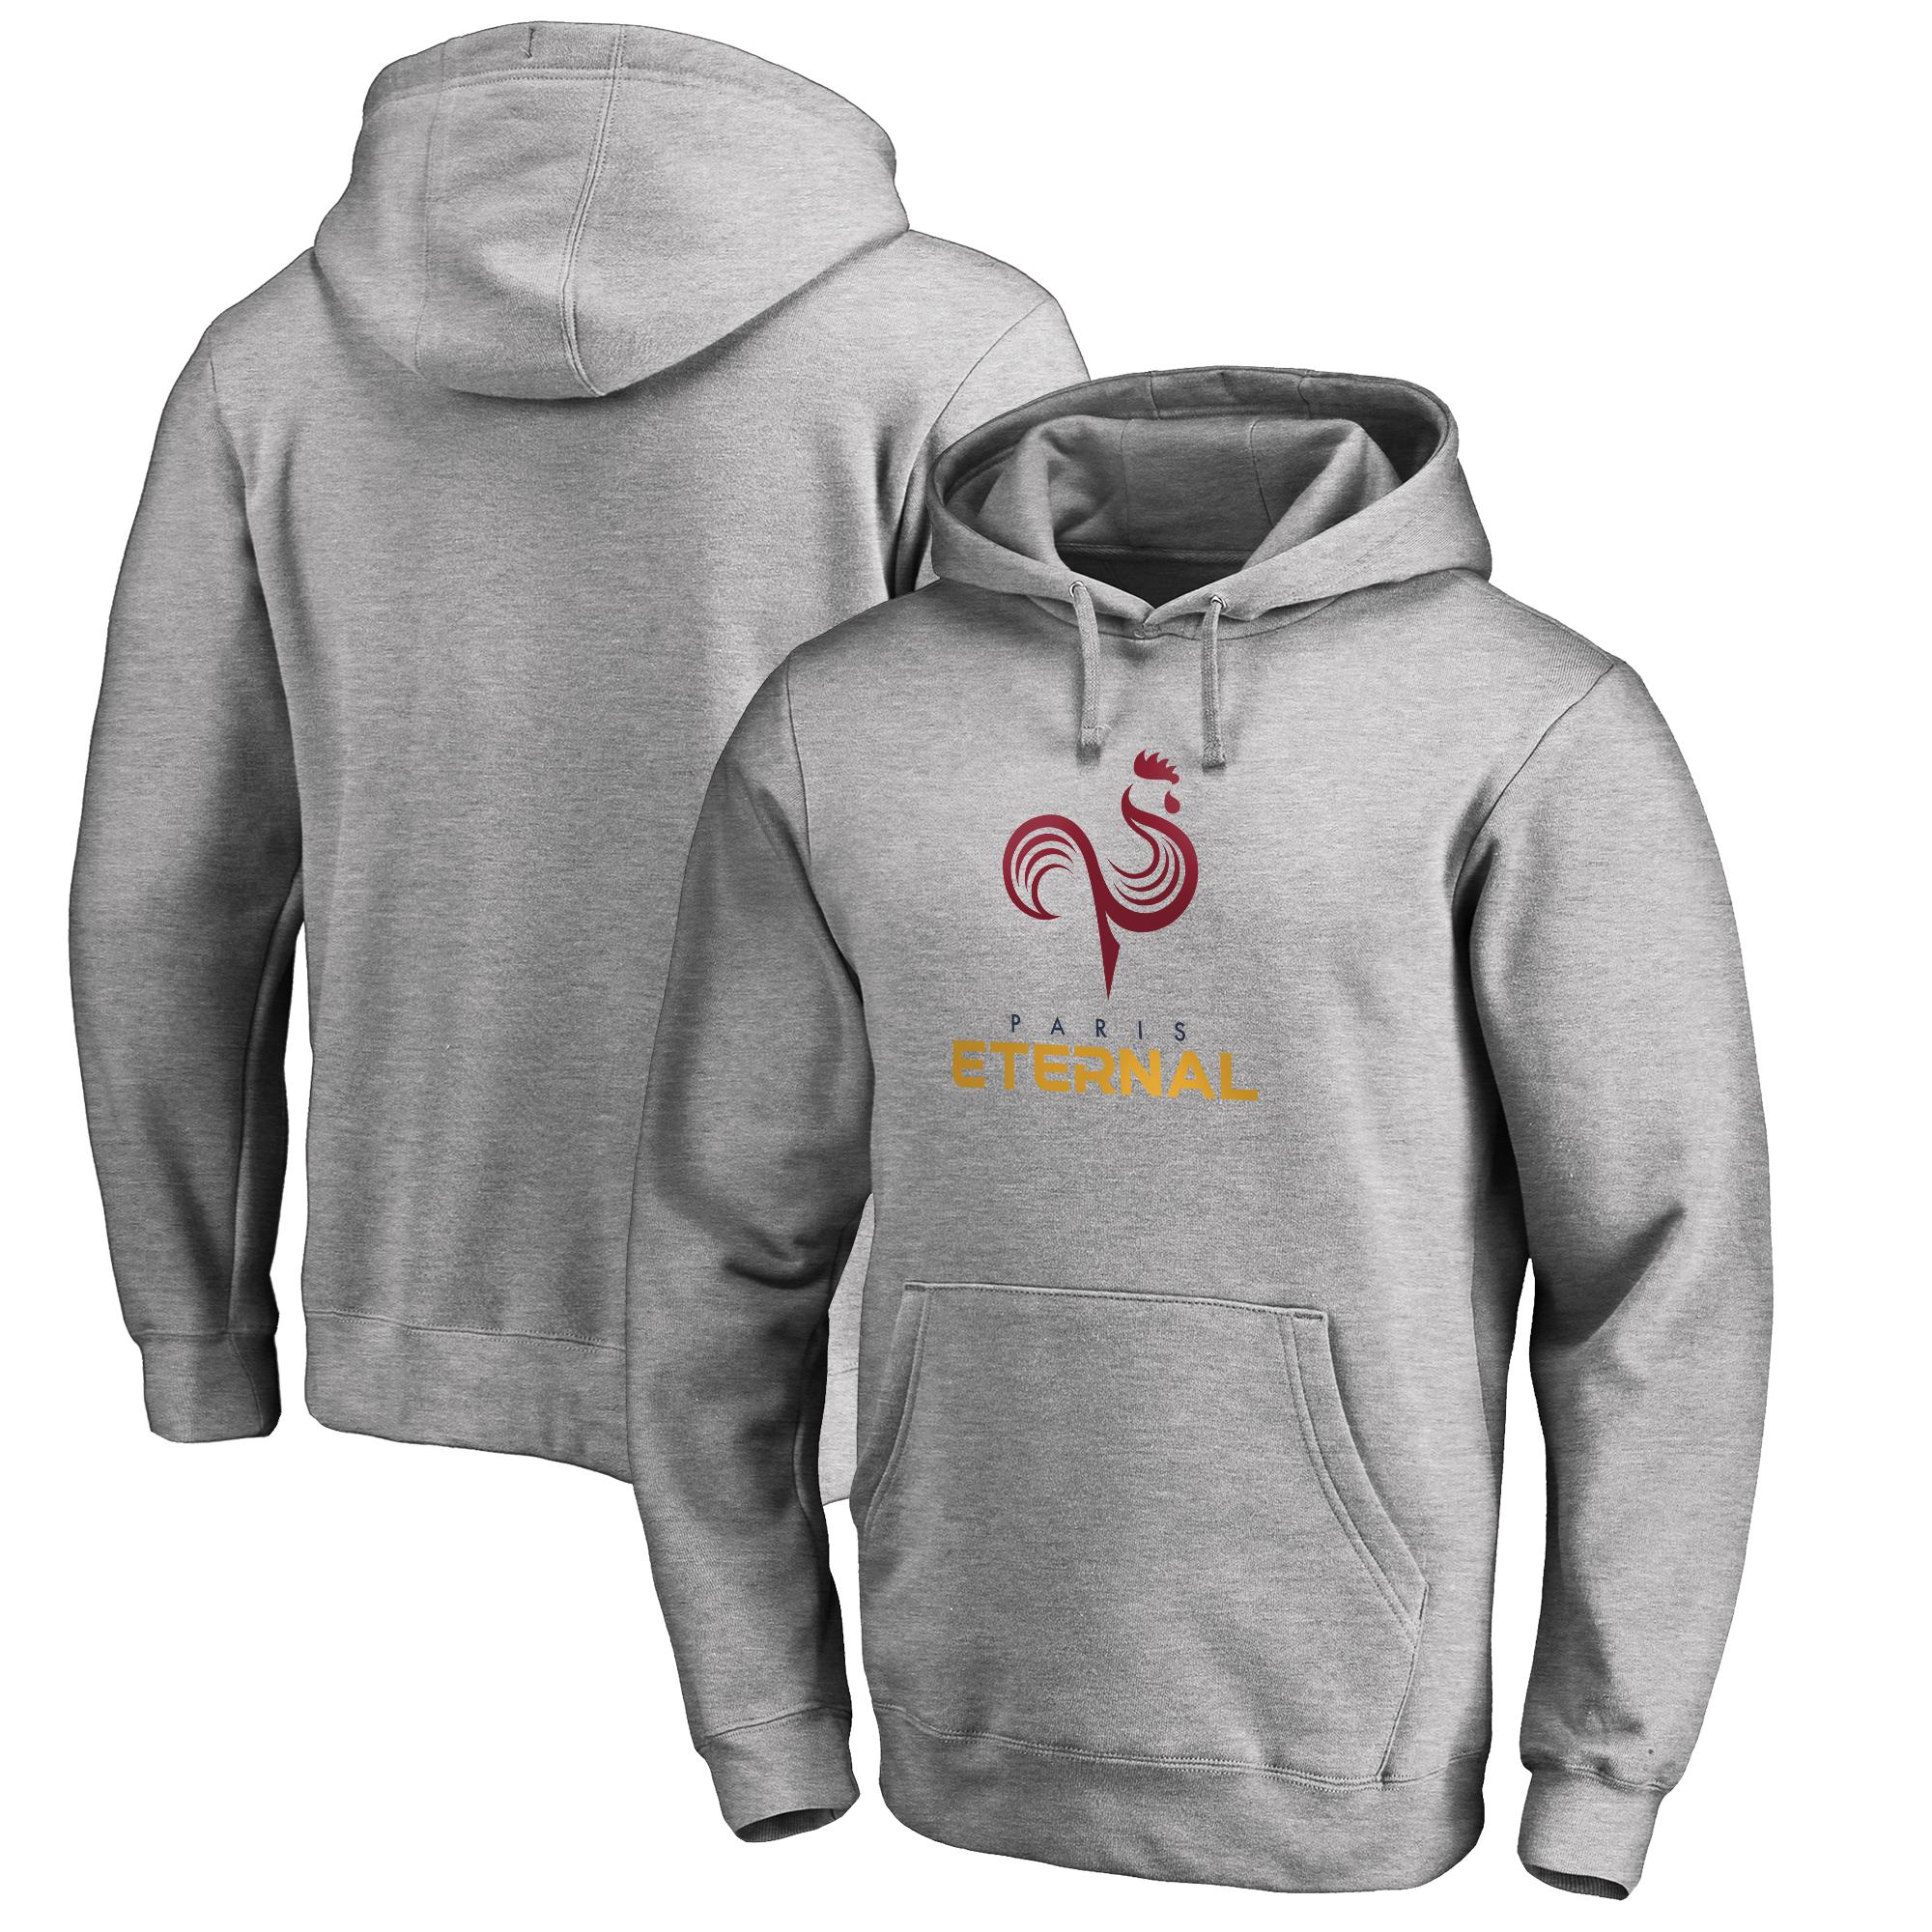 Paris Eternal Fanatics Branded Team Identity Pullover Hoodie - Heathered Gray